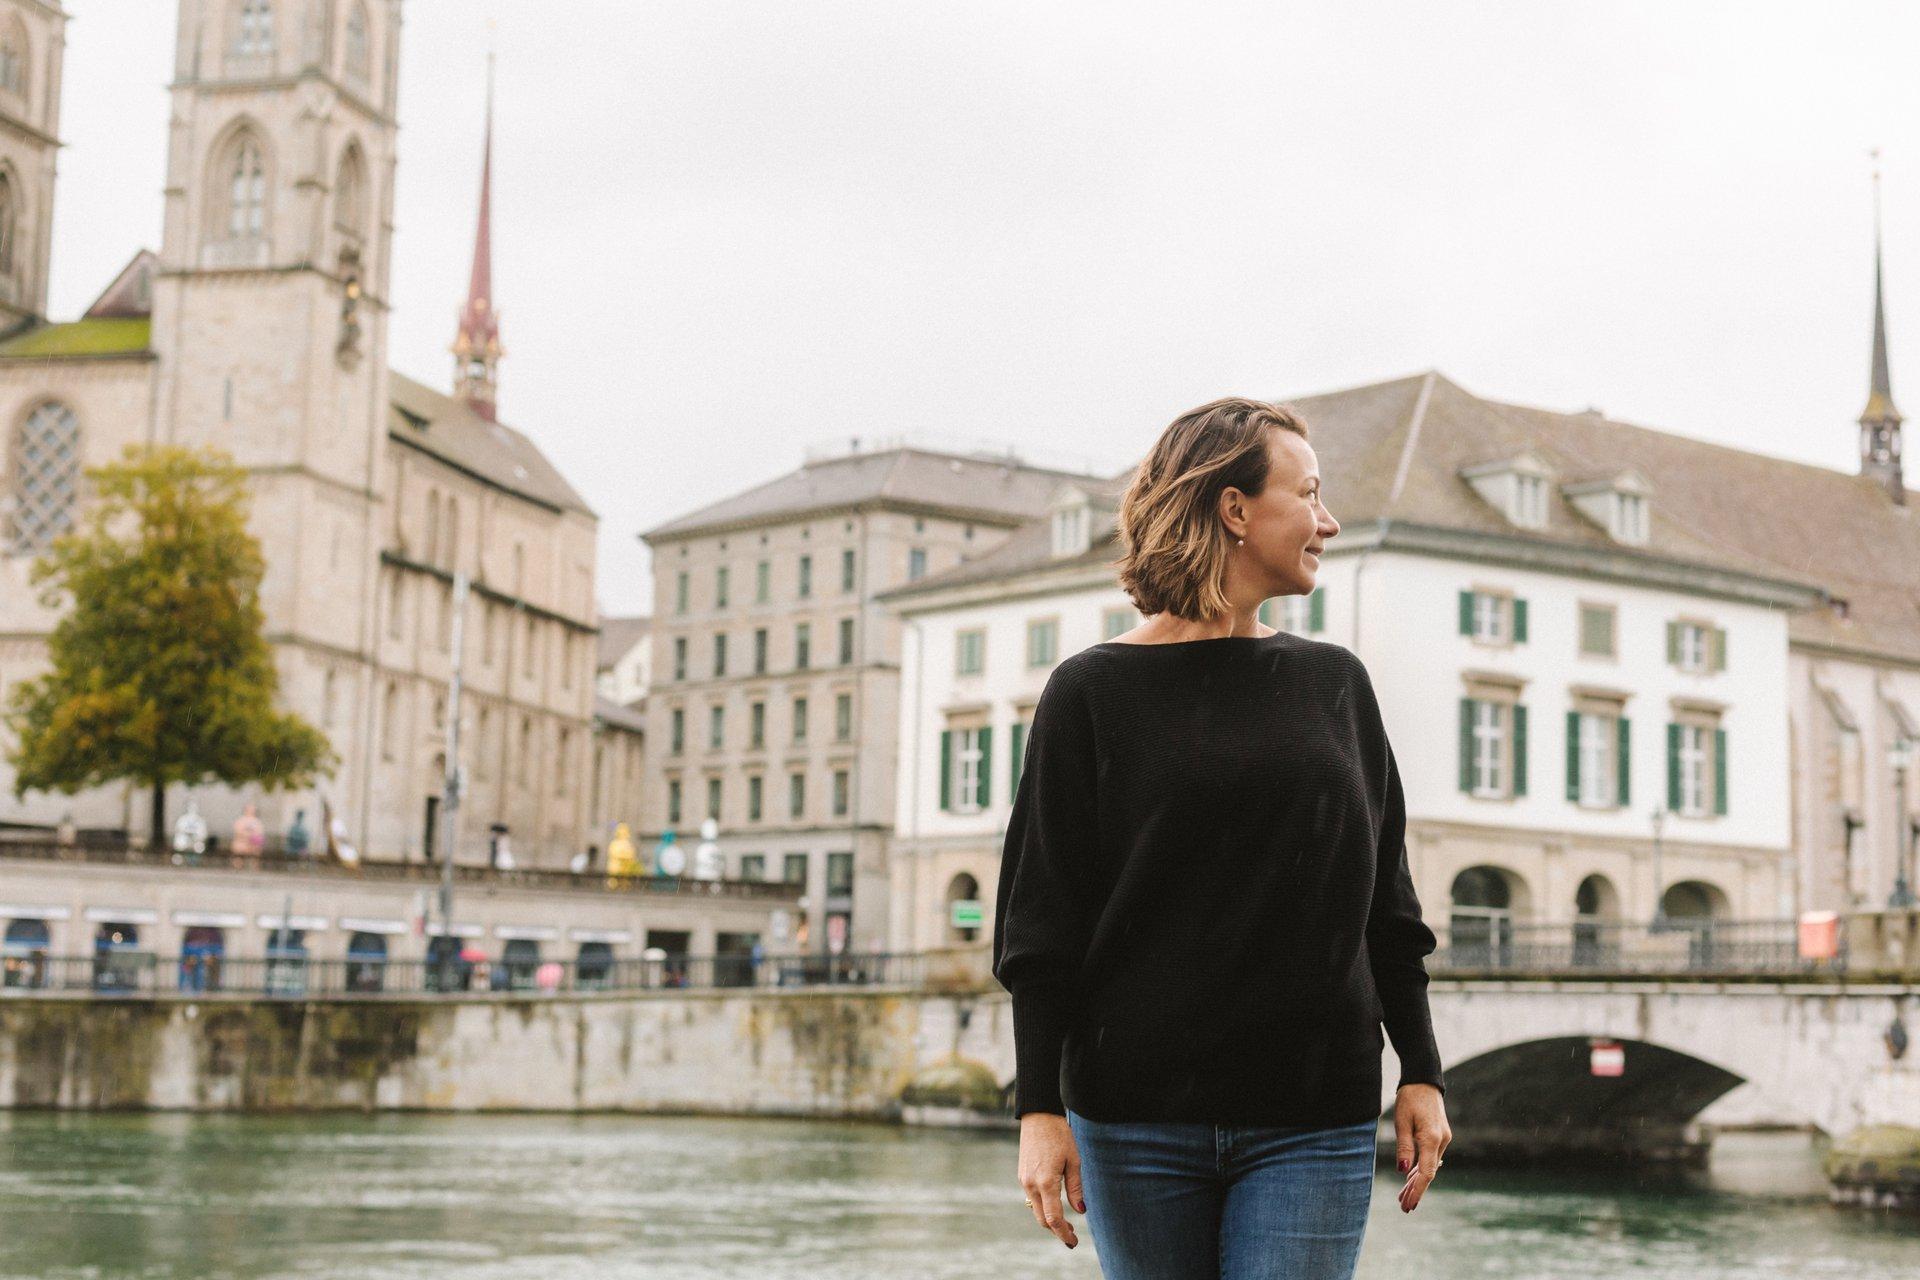 Zurich-Switzerland-travel-story-Flytographer-5